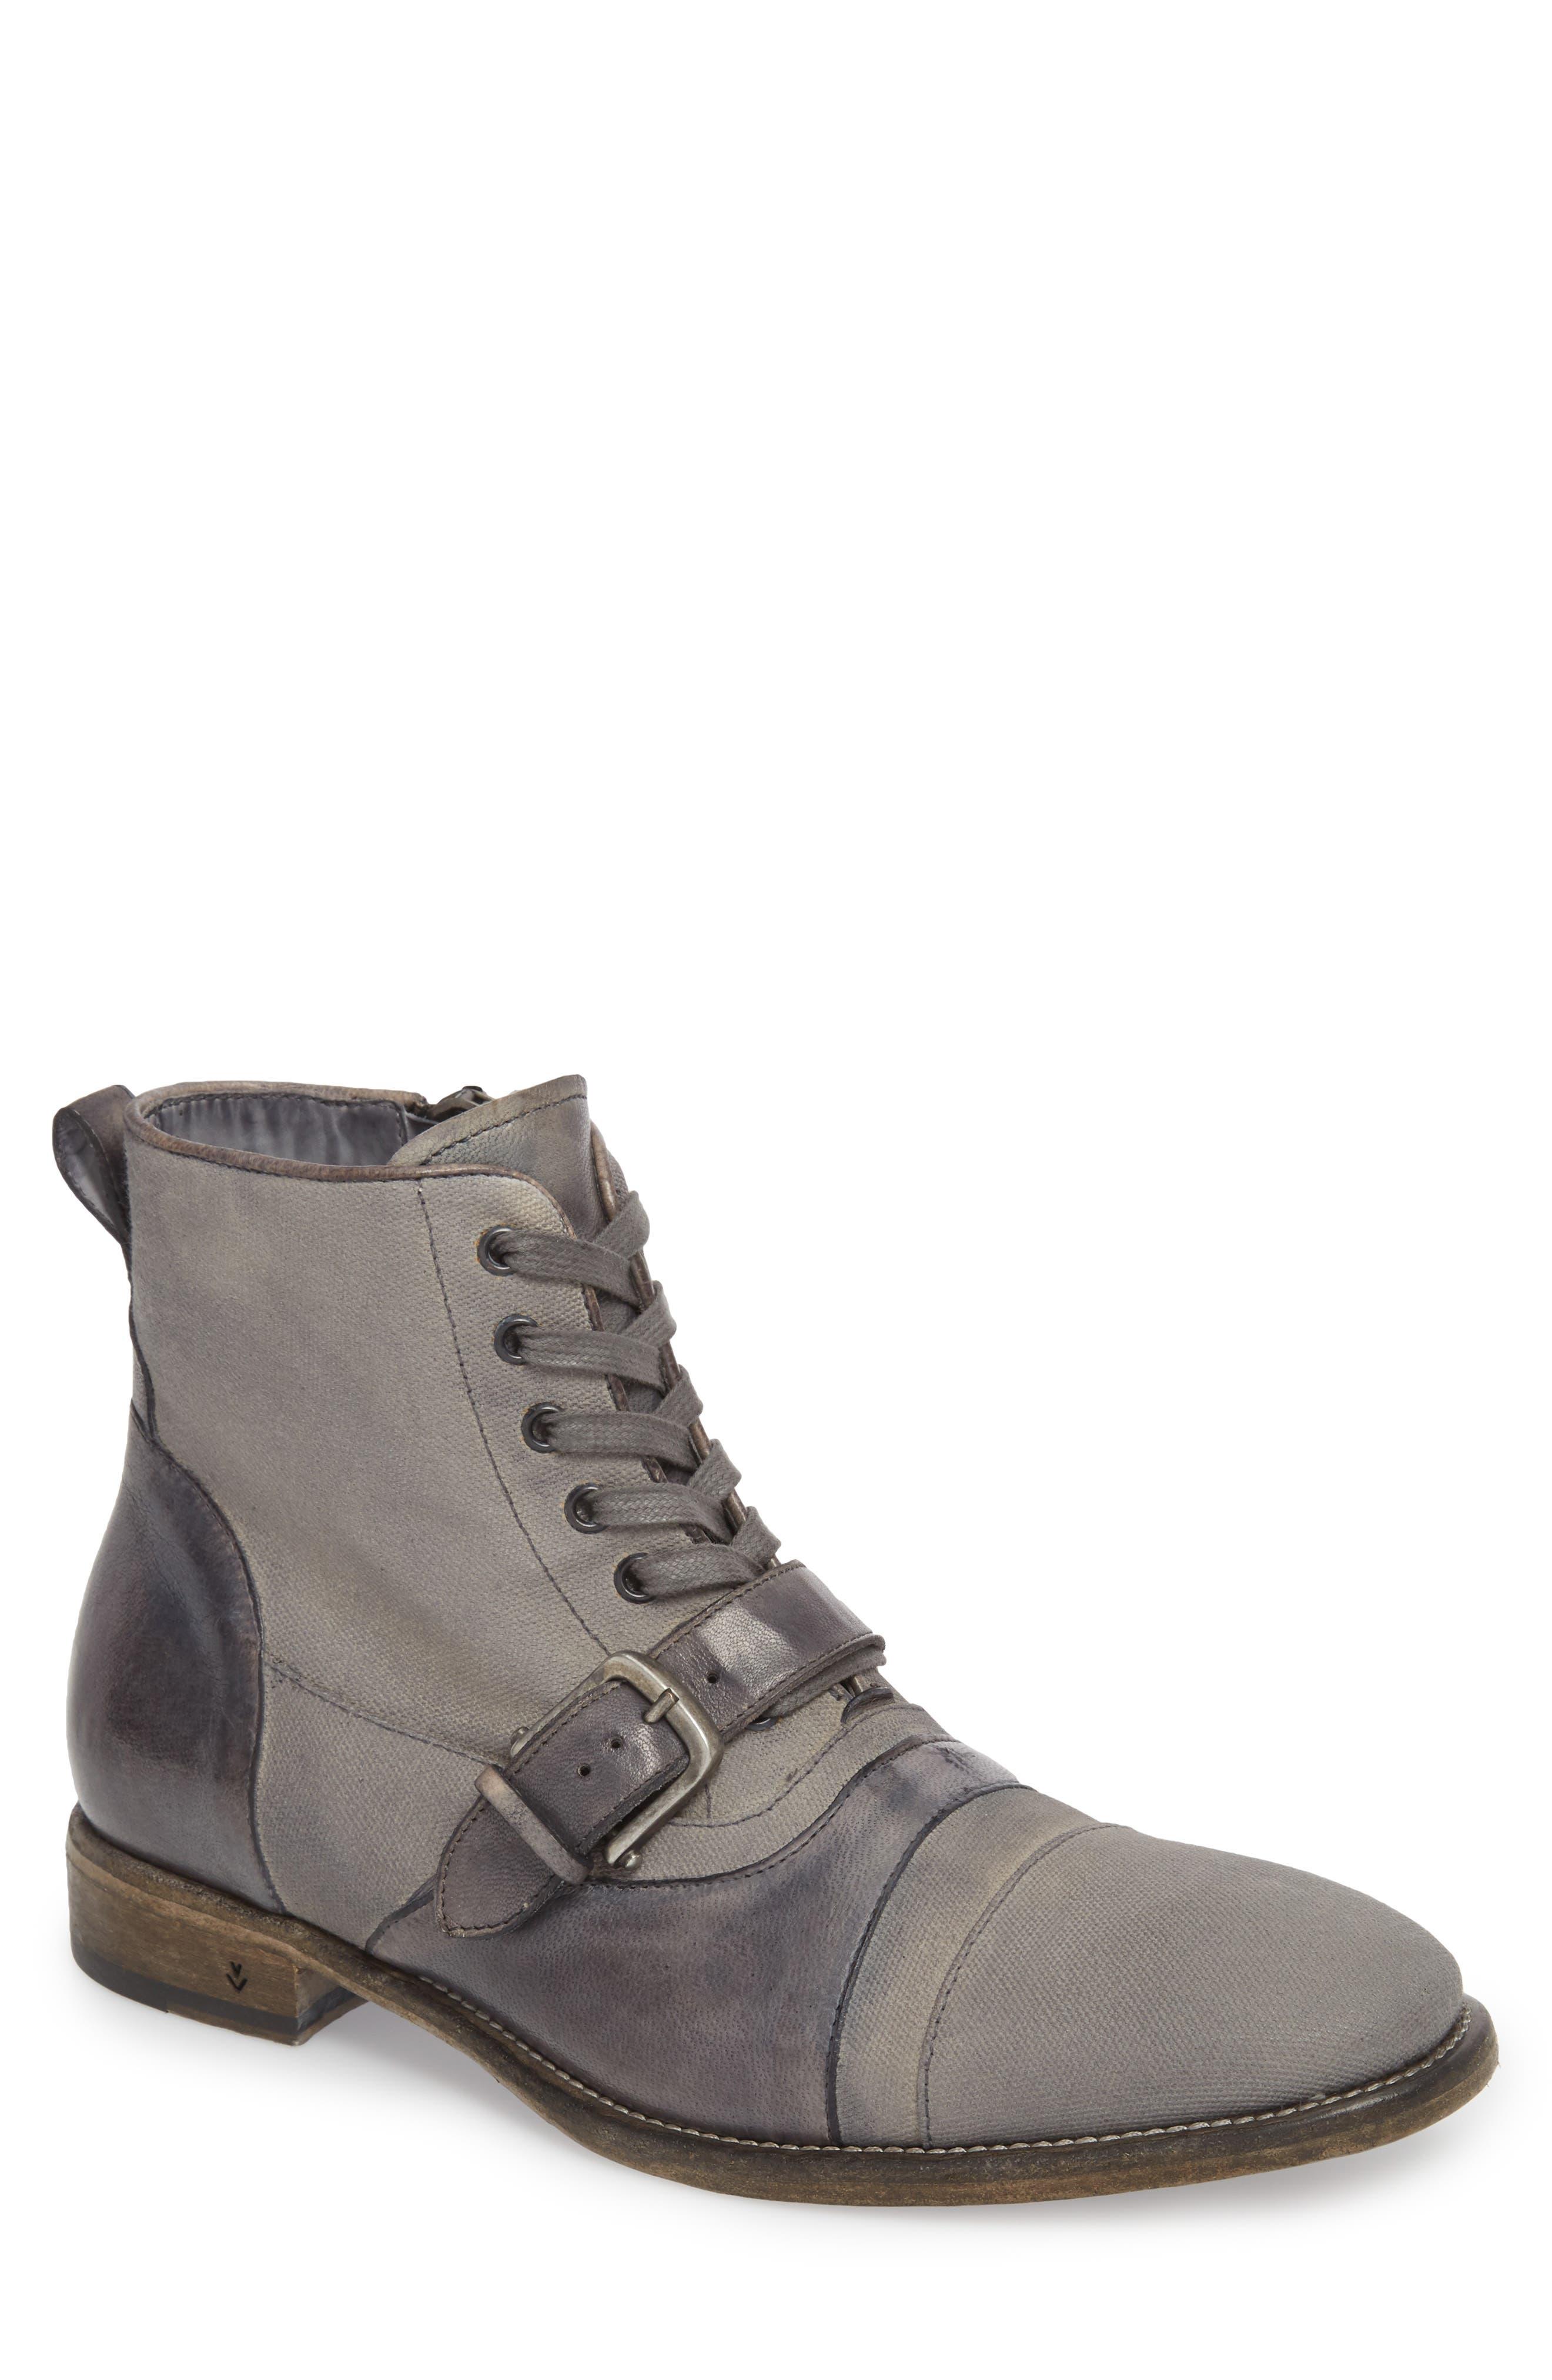 John Varvatos Fleetwood Buckle Cricket Boot,                         Main,                         color, Lead Canvas/ Leather